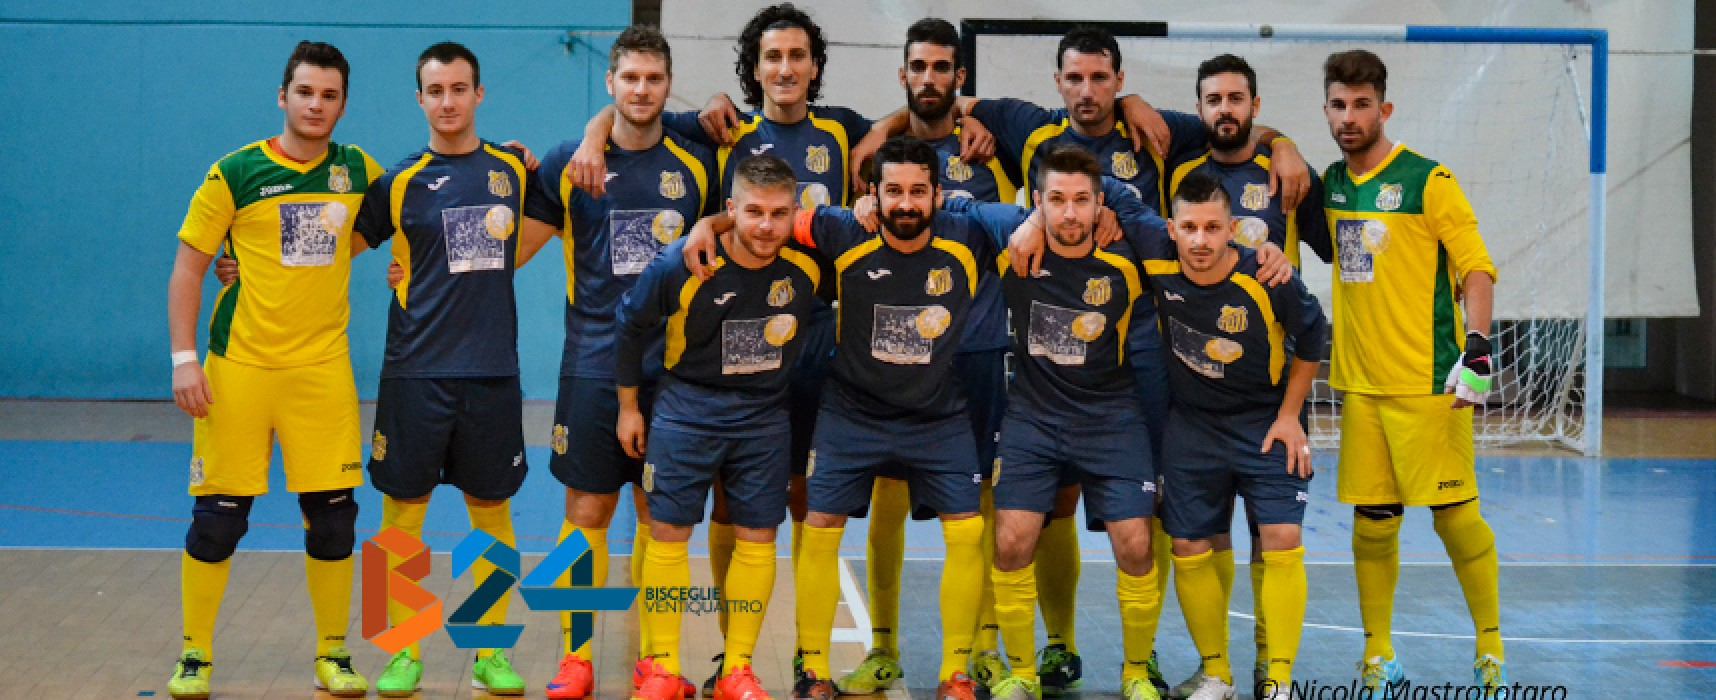 Santos Club playout terribile, sconfitto dal Futsal Club retrocede in serie C2